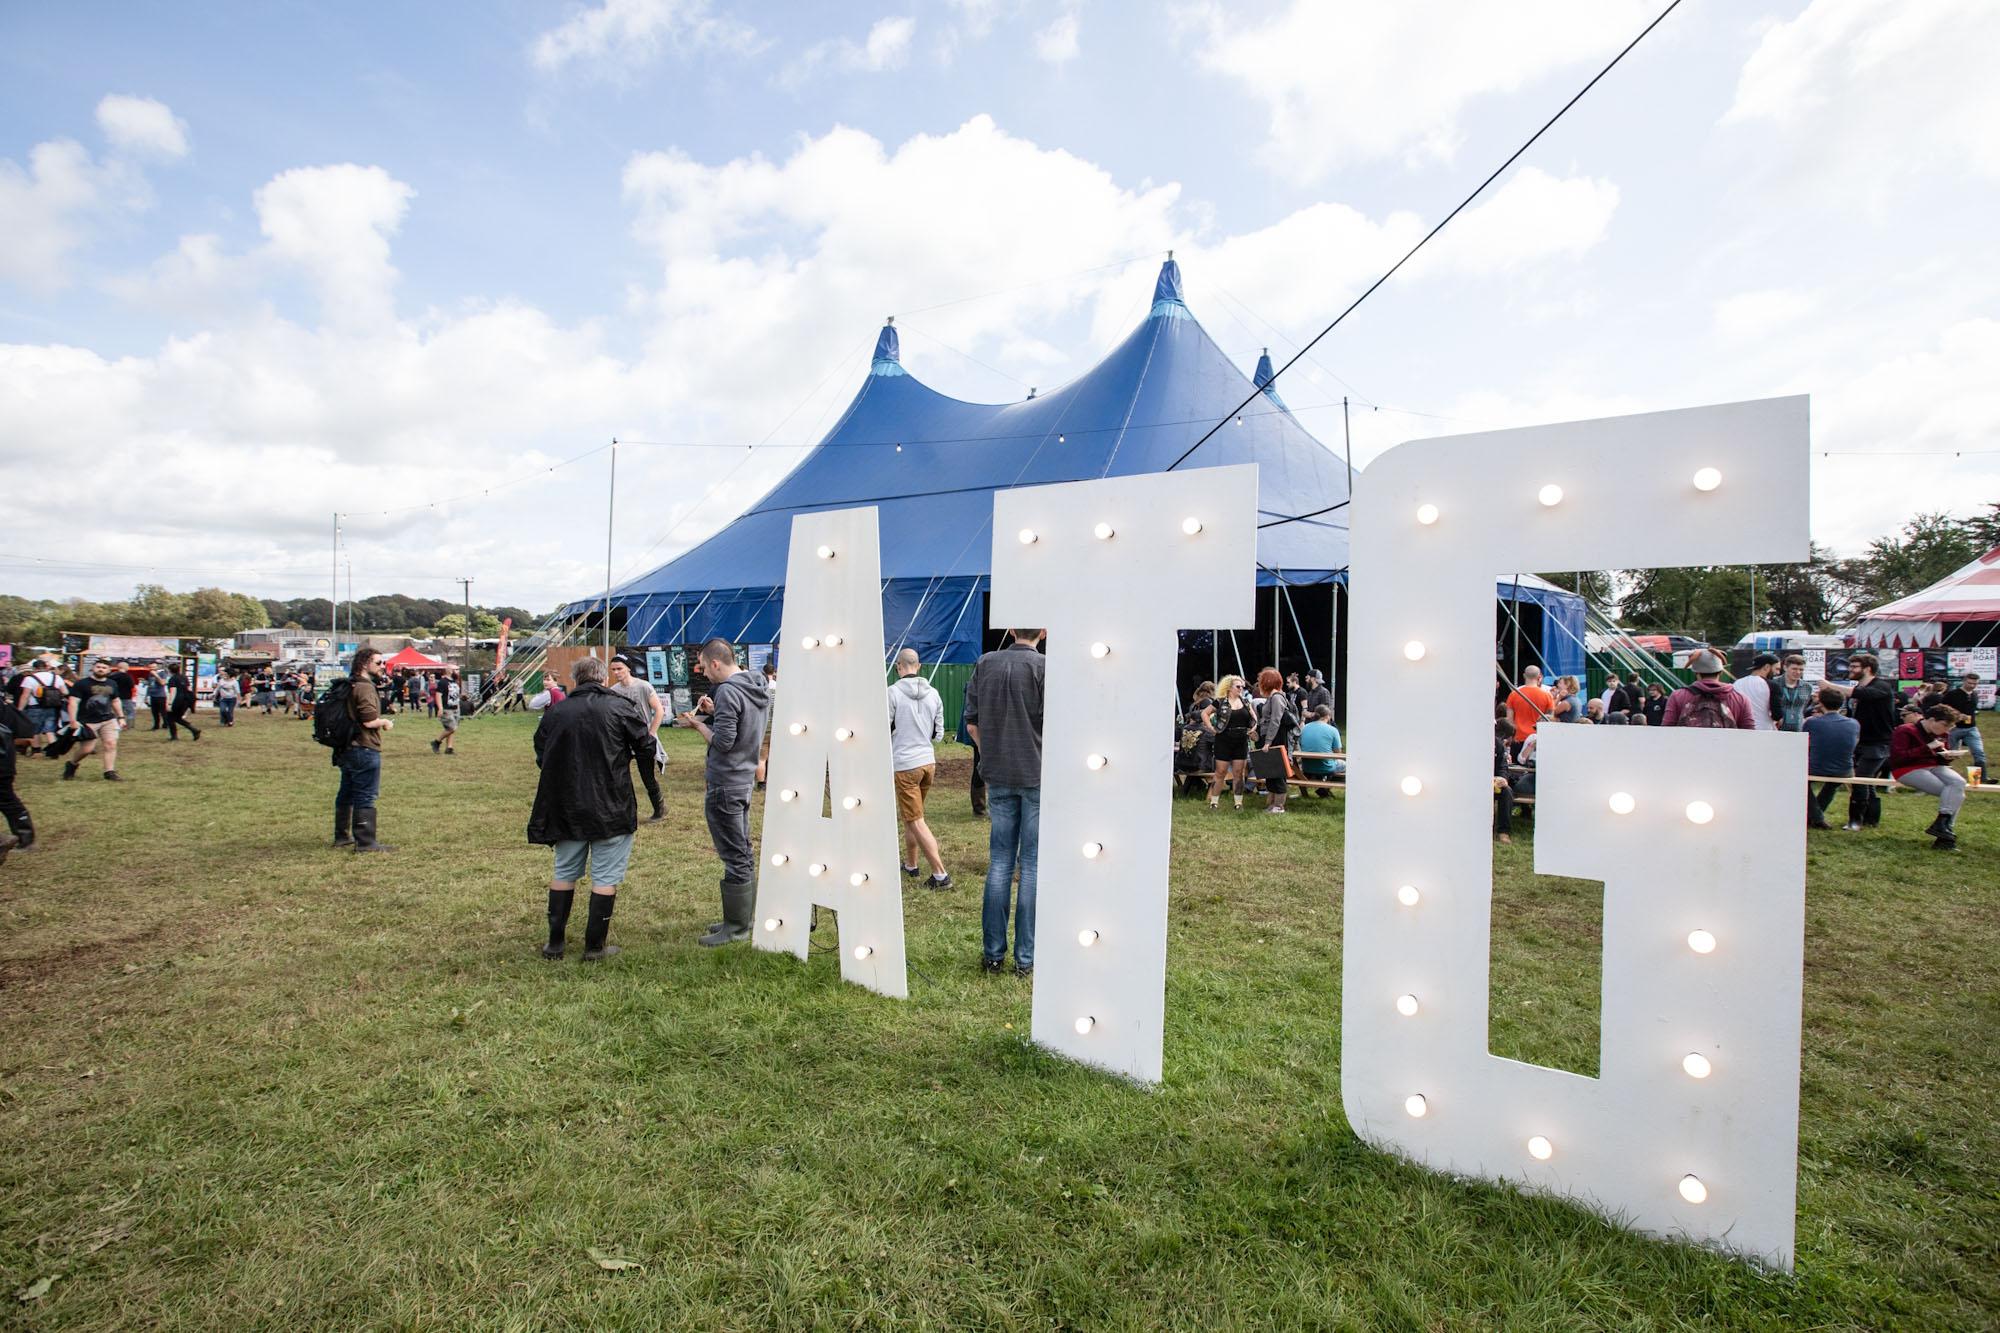 ArcTanGent Festival 2019